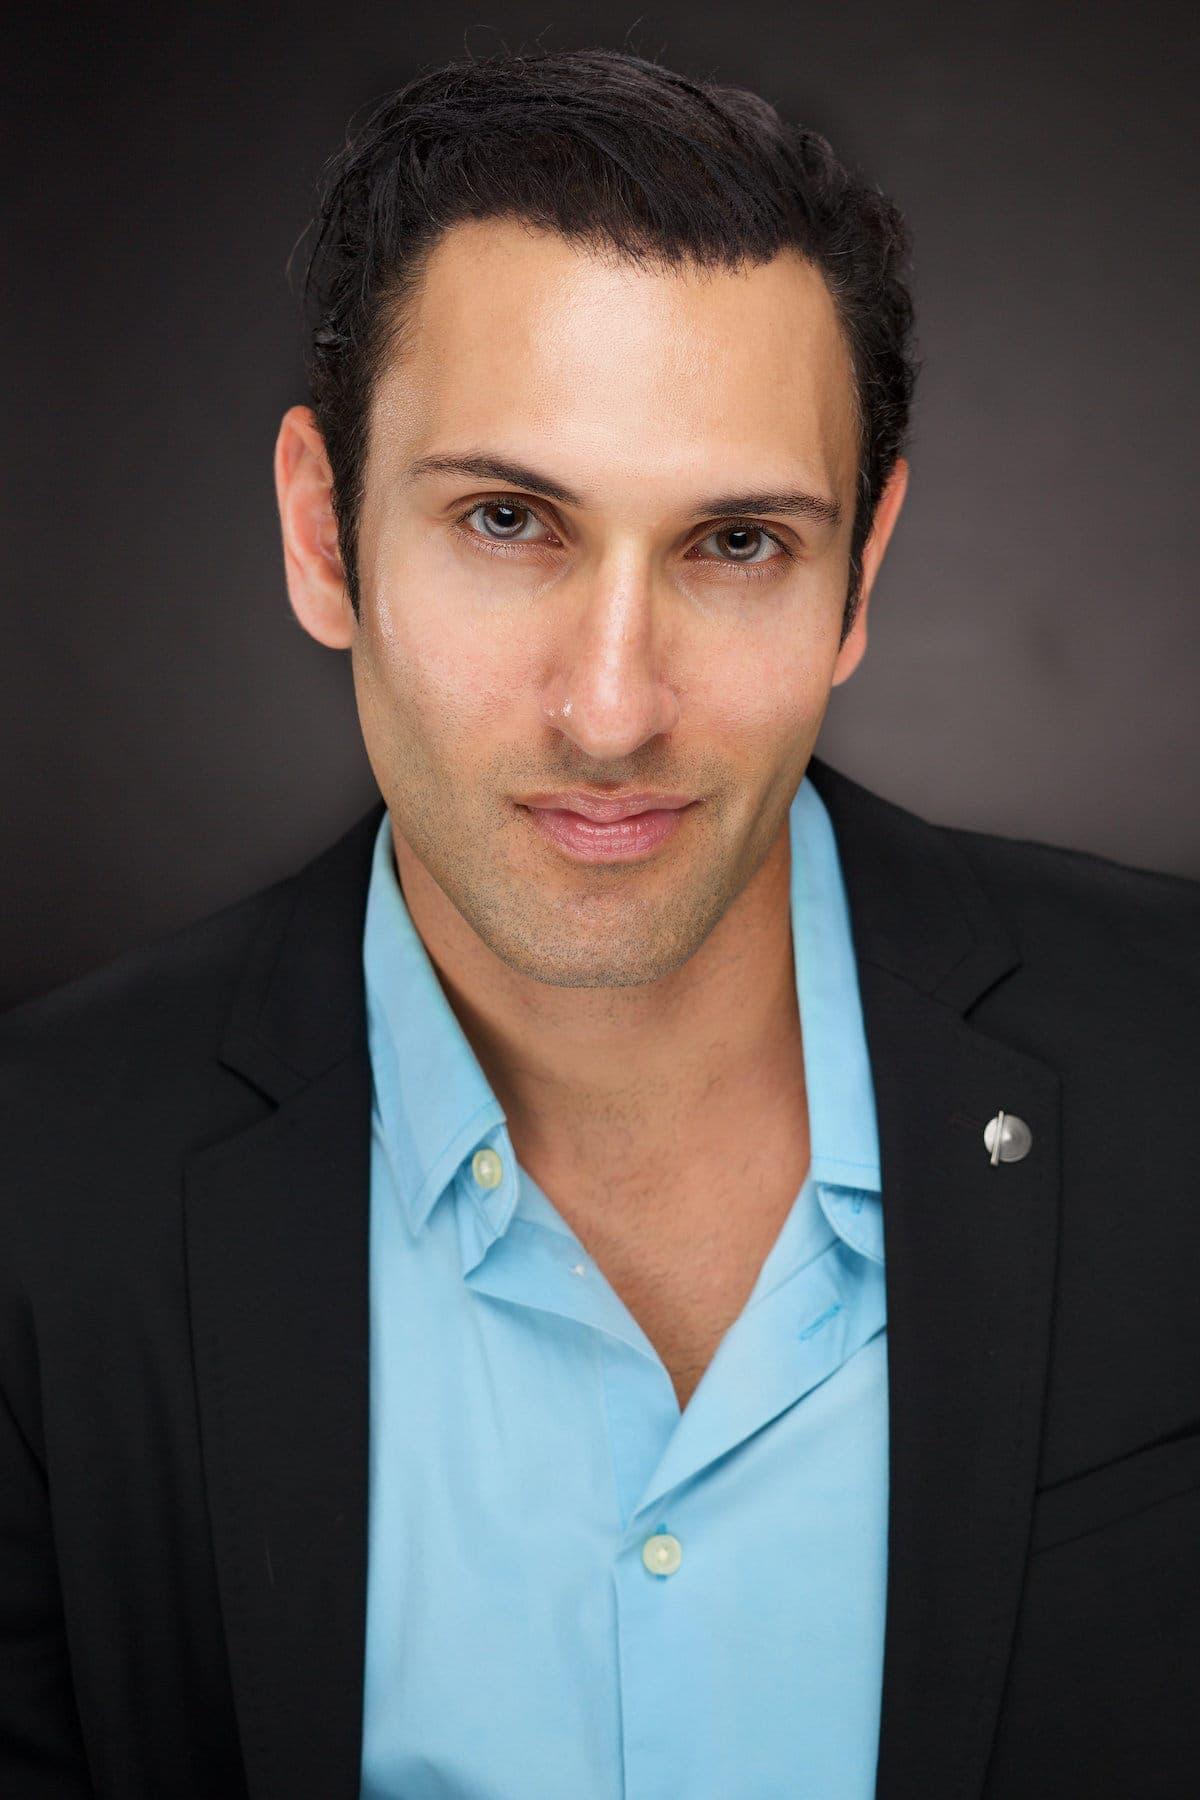 Chris Vij Acting Headshot pt6